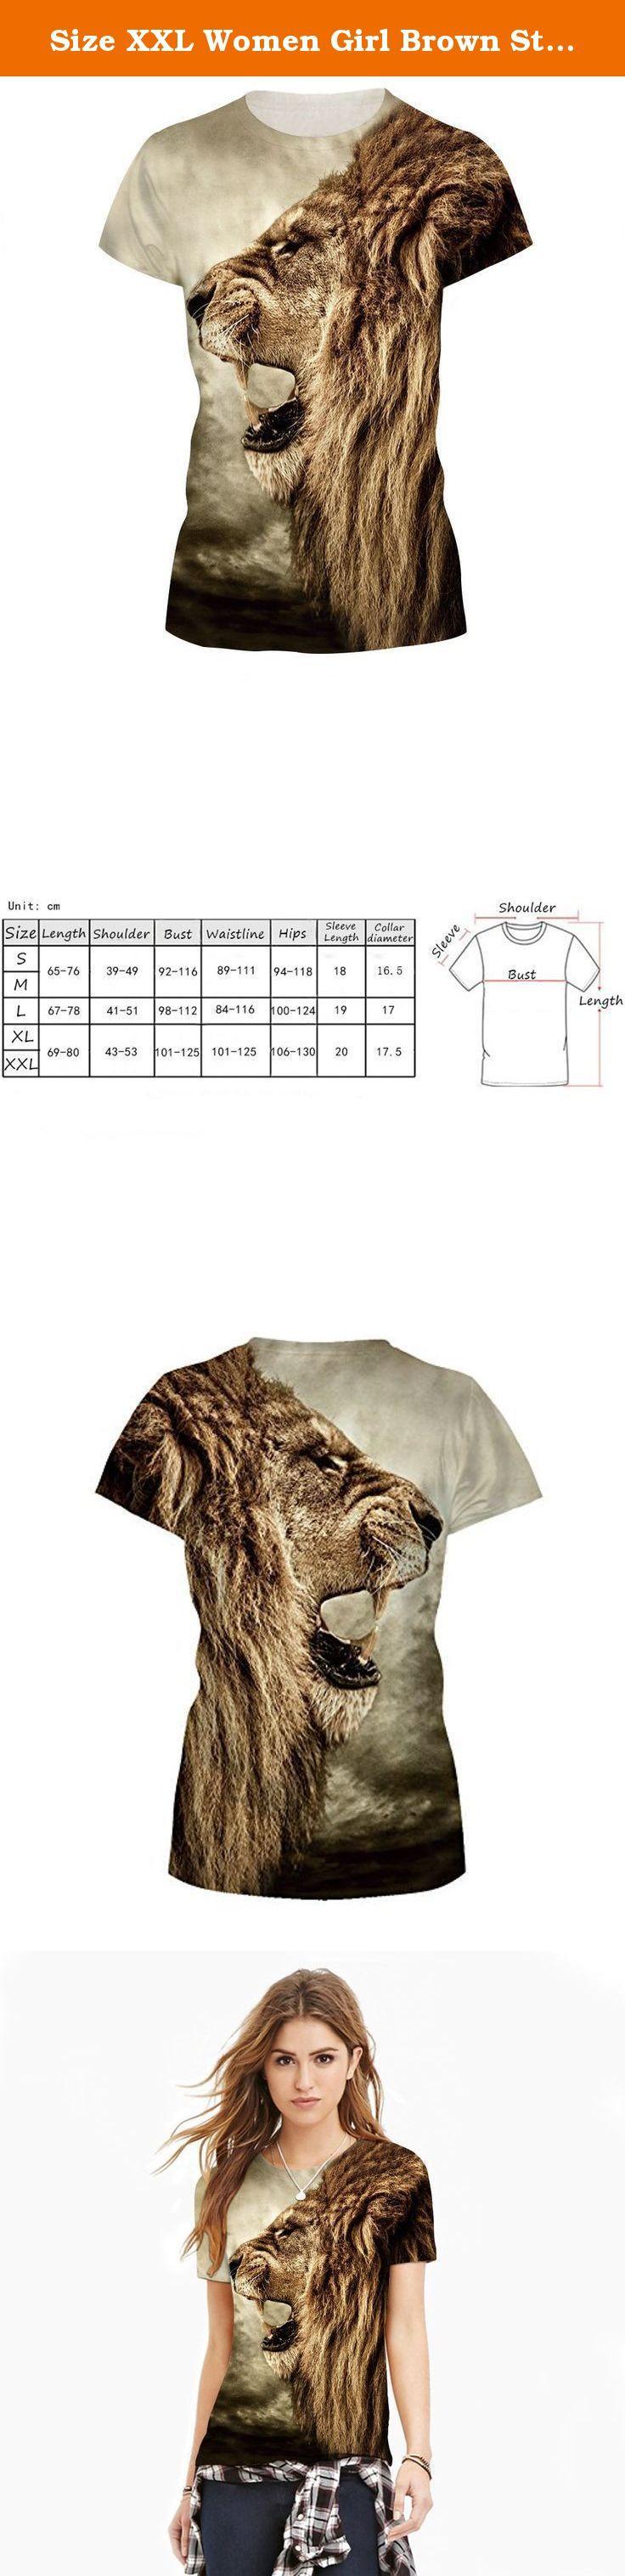 Size XXL Women Girl Brown Styish Tiger 3D Digital Printed T-shirt Harajuku Te. t-shirt.